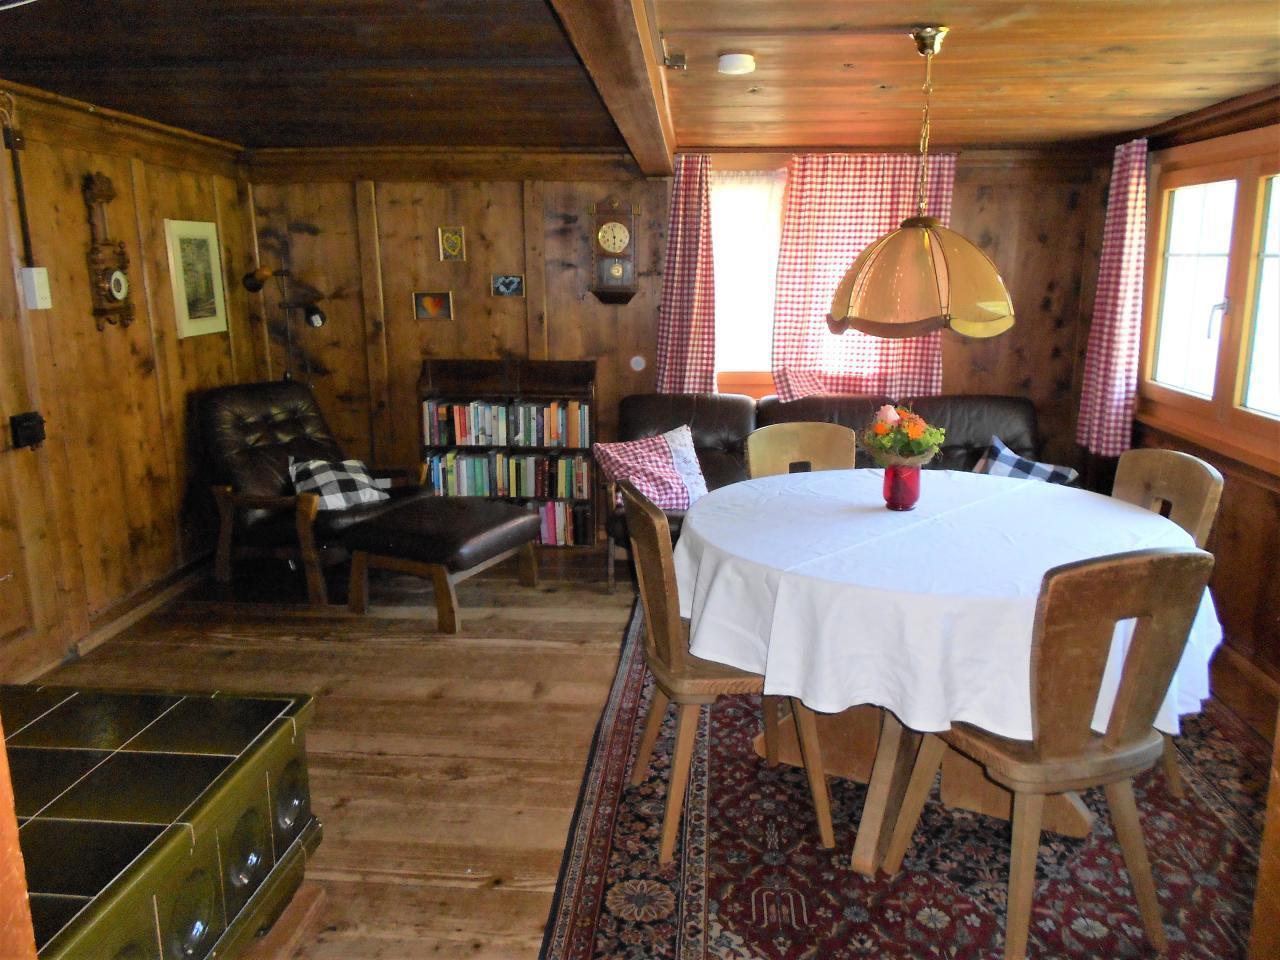 Maison de vacances Alpenrösli in Nesslau (2640830), Nesslau, Toggenbourg, Suisse Orientale, Suisse, image 2